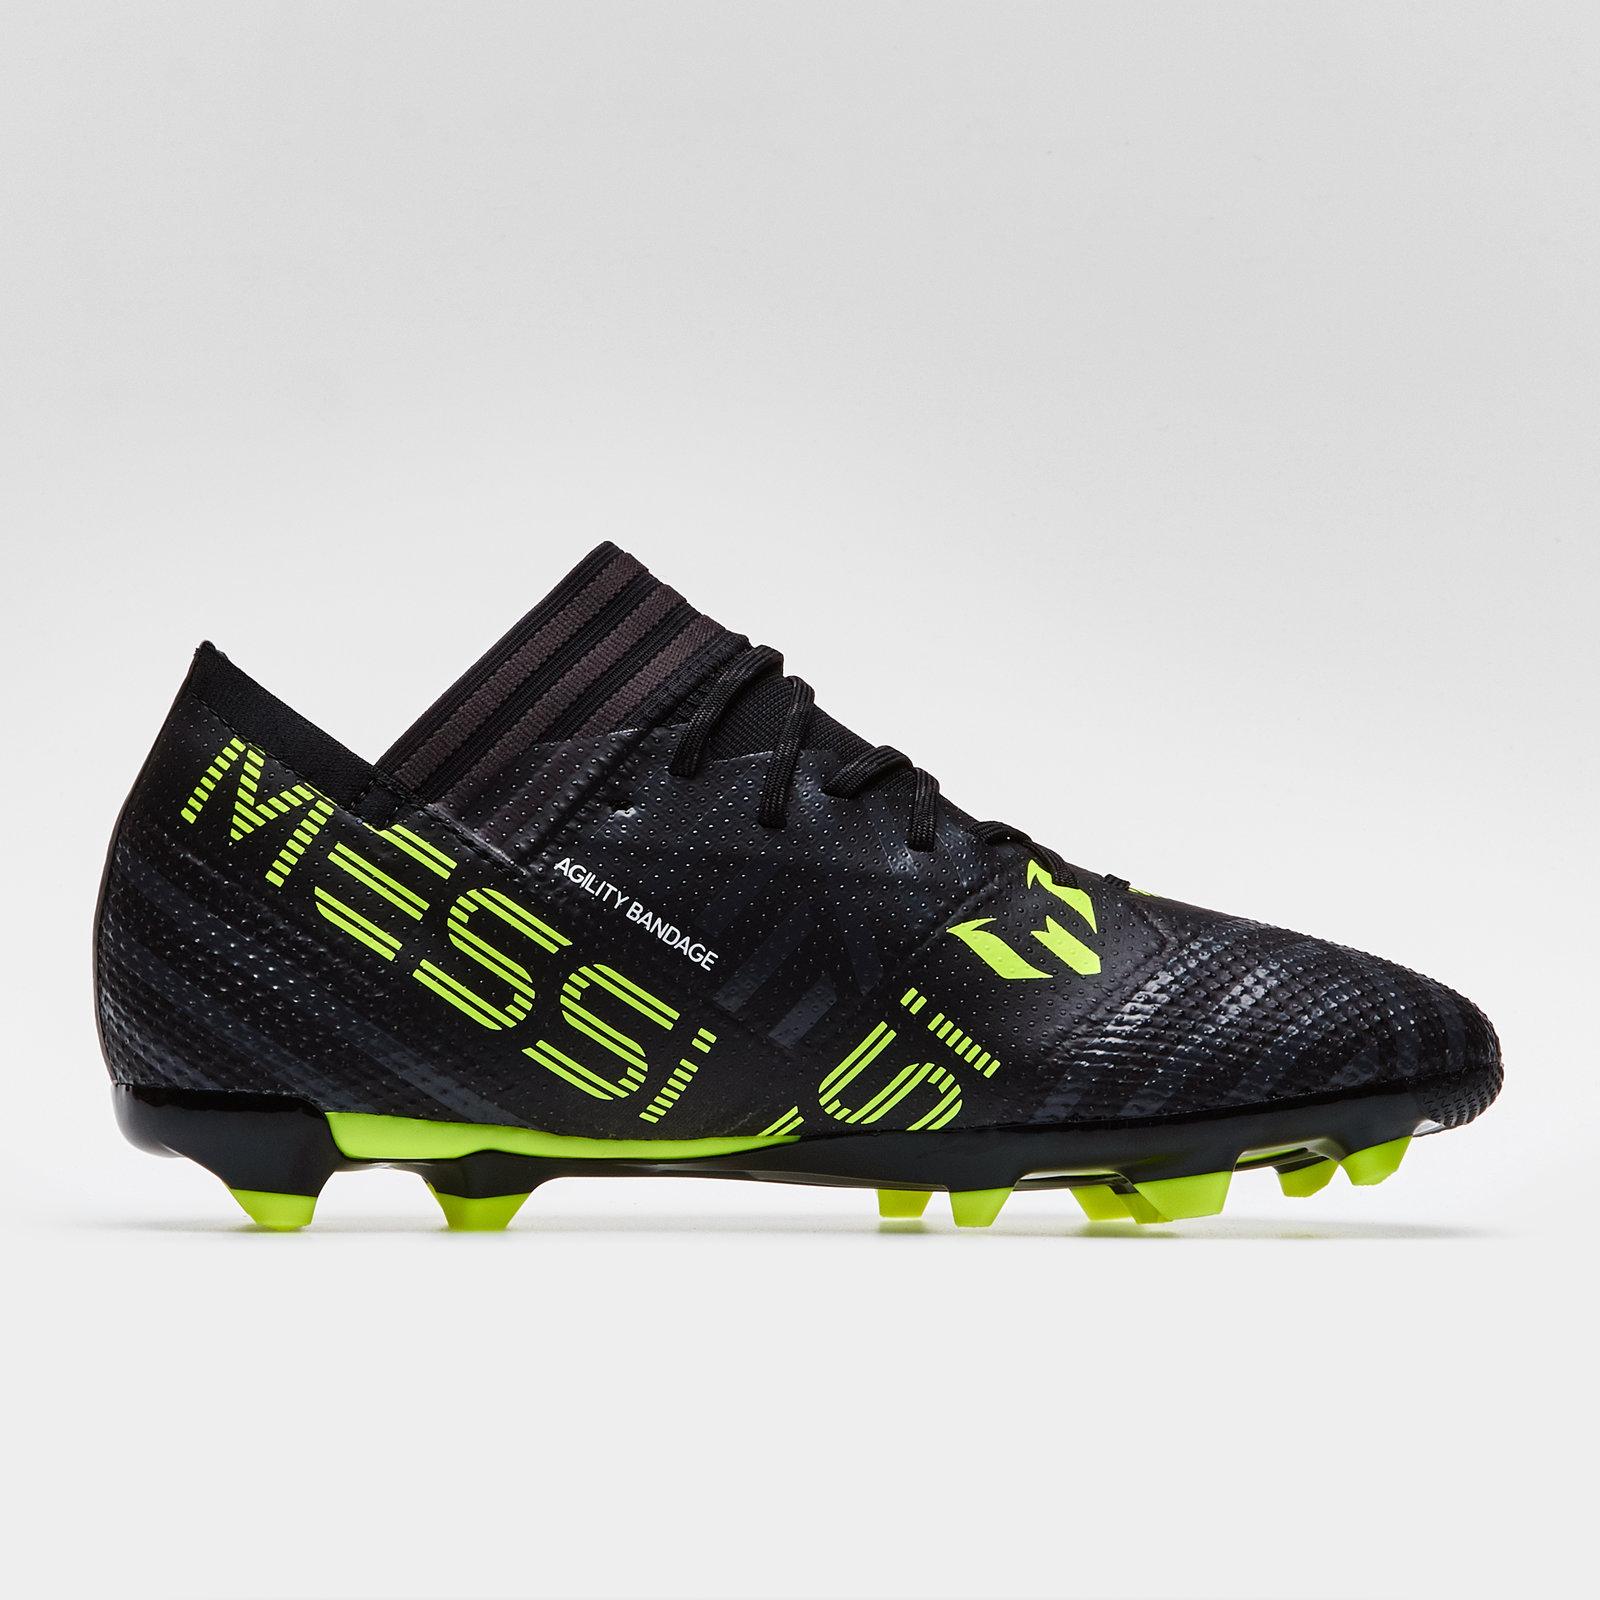 2ab3b12003ea adidas unisex Nemeziz Messi 17.1 FG Kids Football Boots Shoes ...